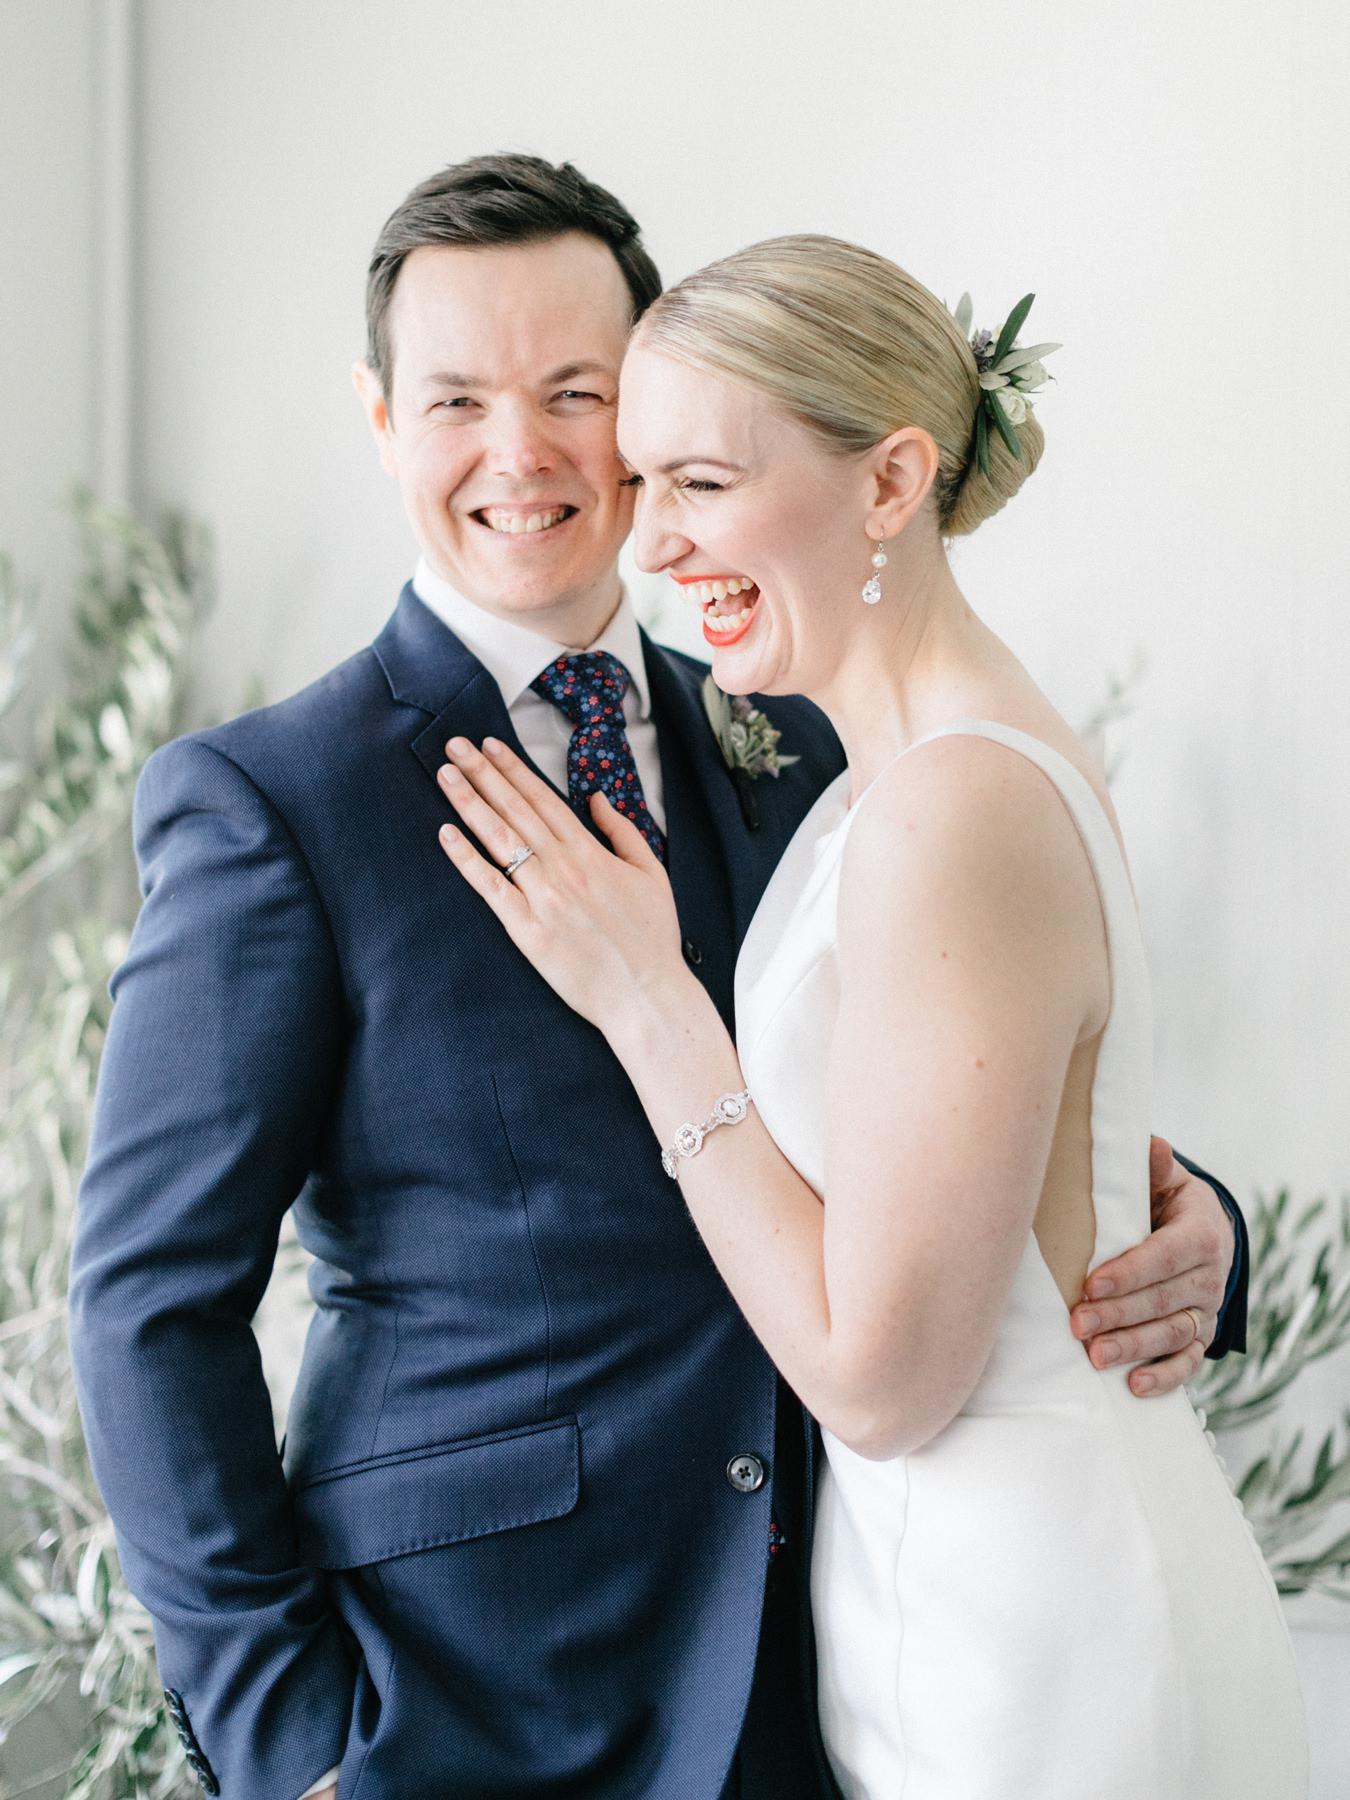 Victoria + David : A Tavola Wedding | Sydney